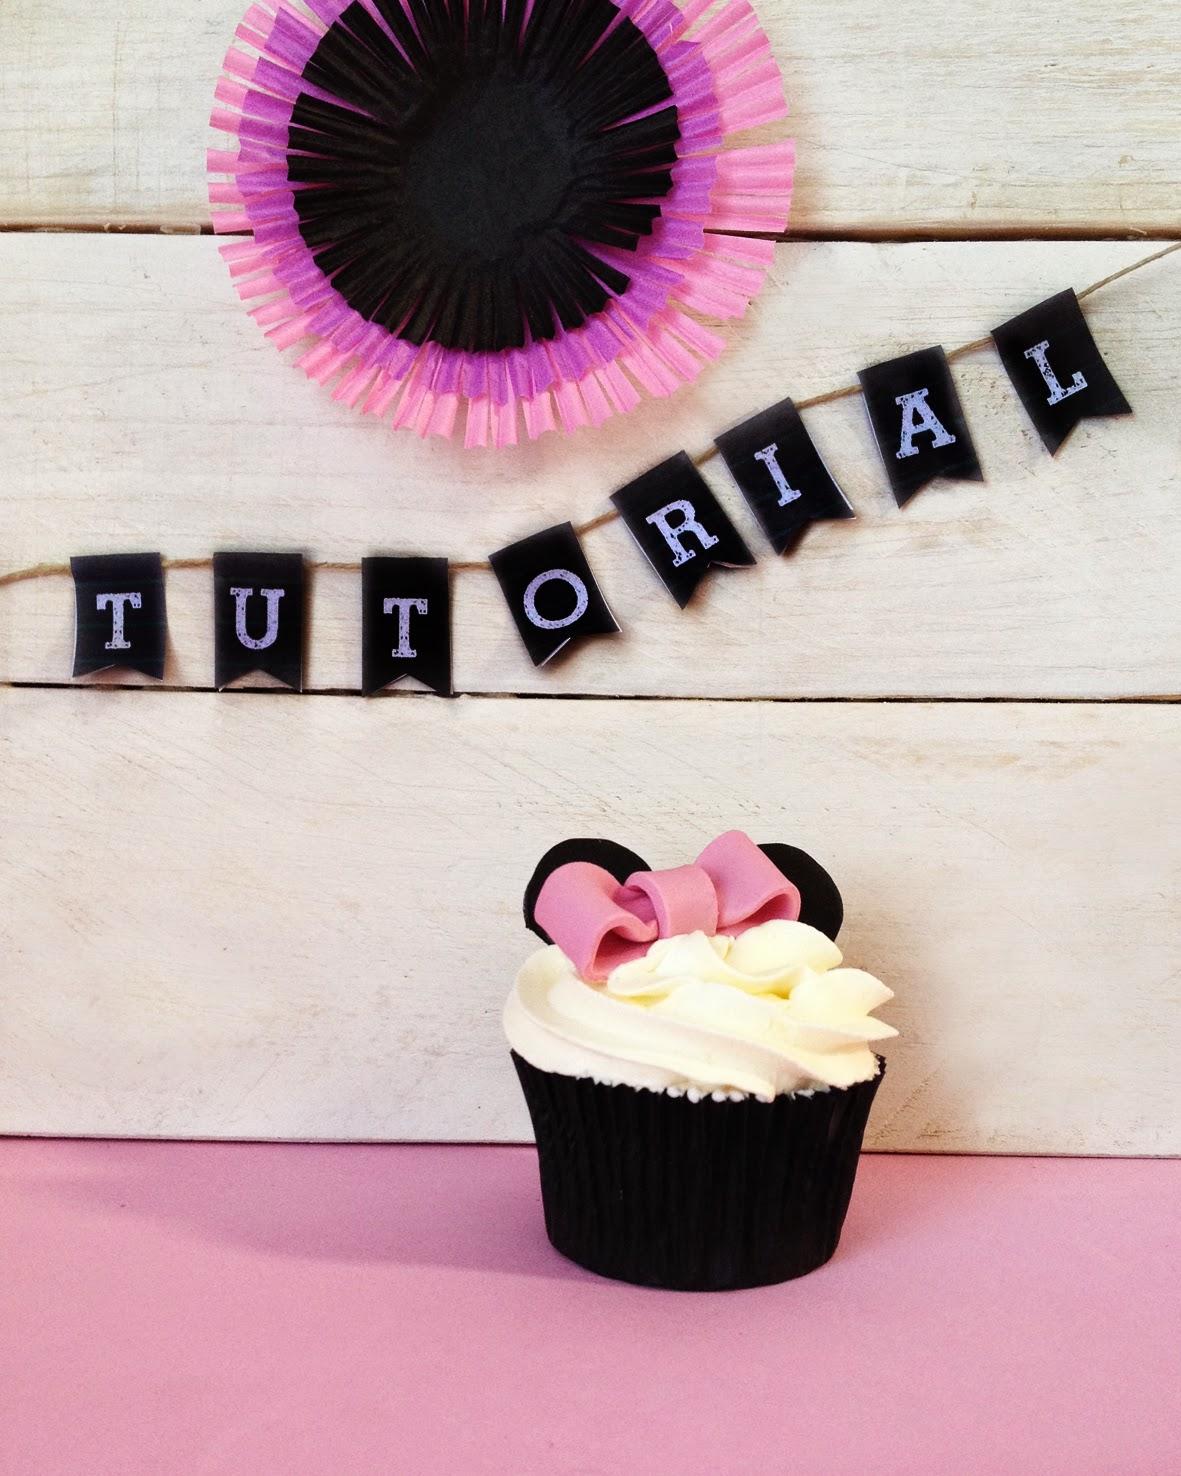 Tutorial Decorar Una Cupcake Al Estilo Minnie Mouse Tendulzo